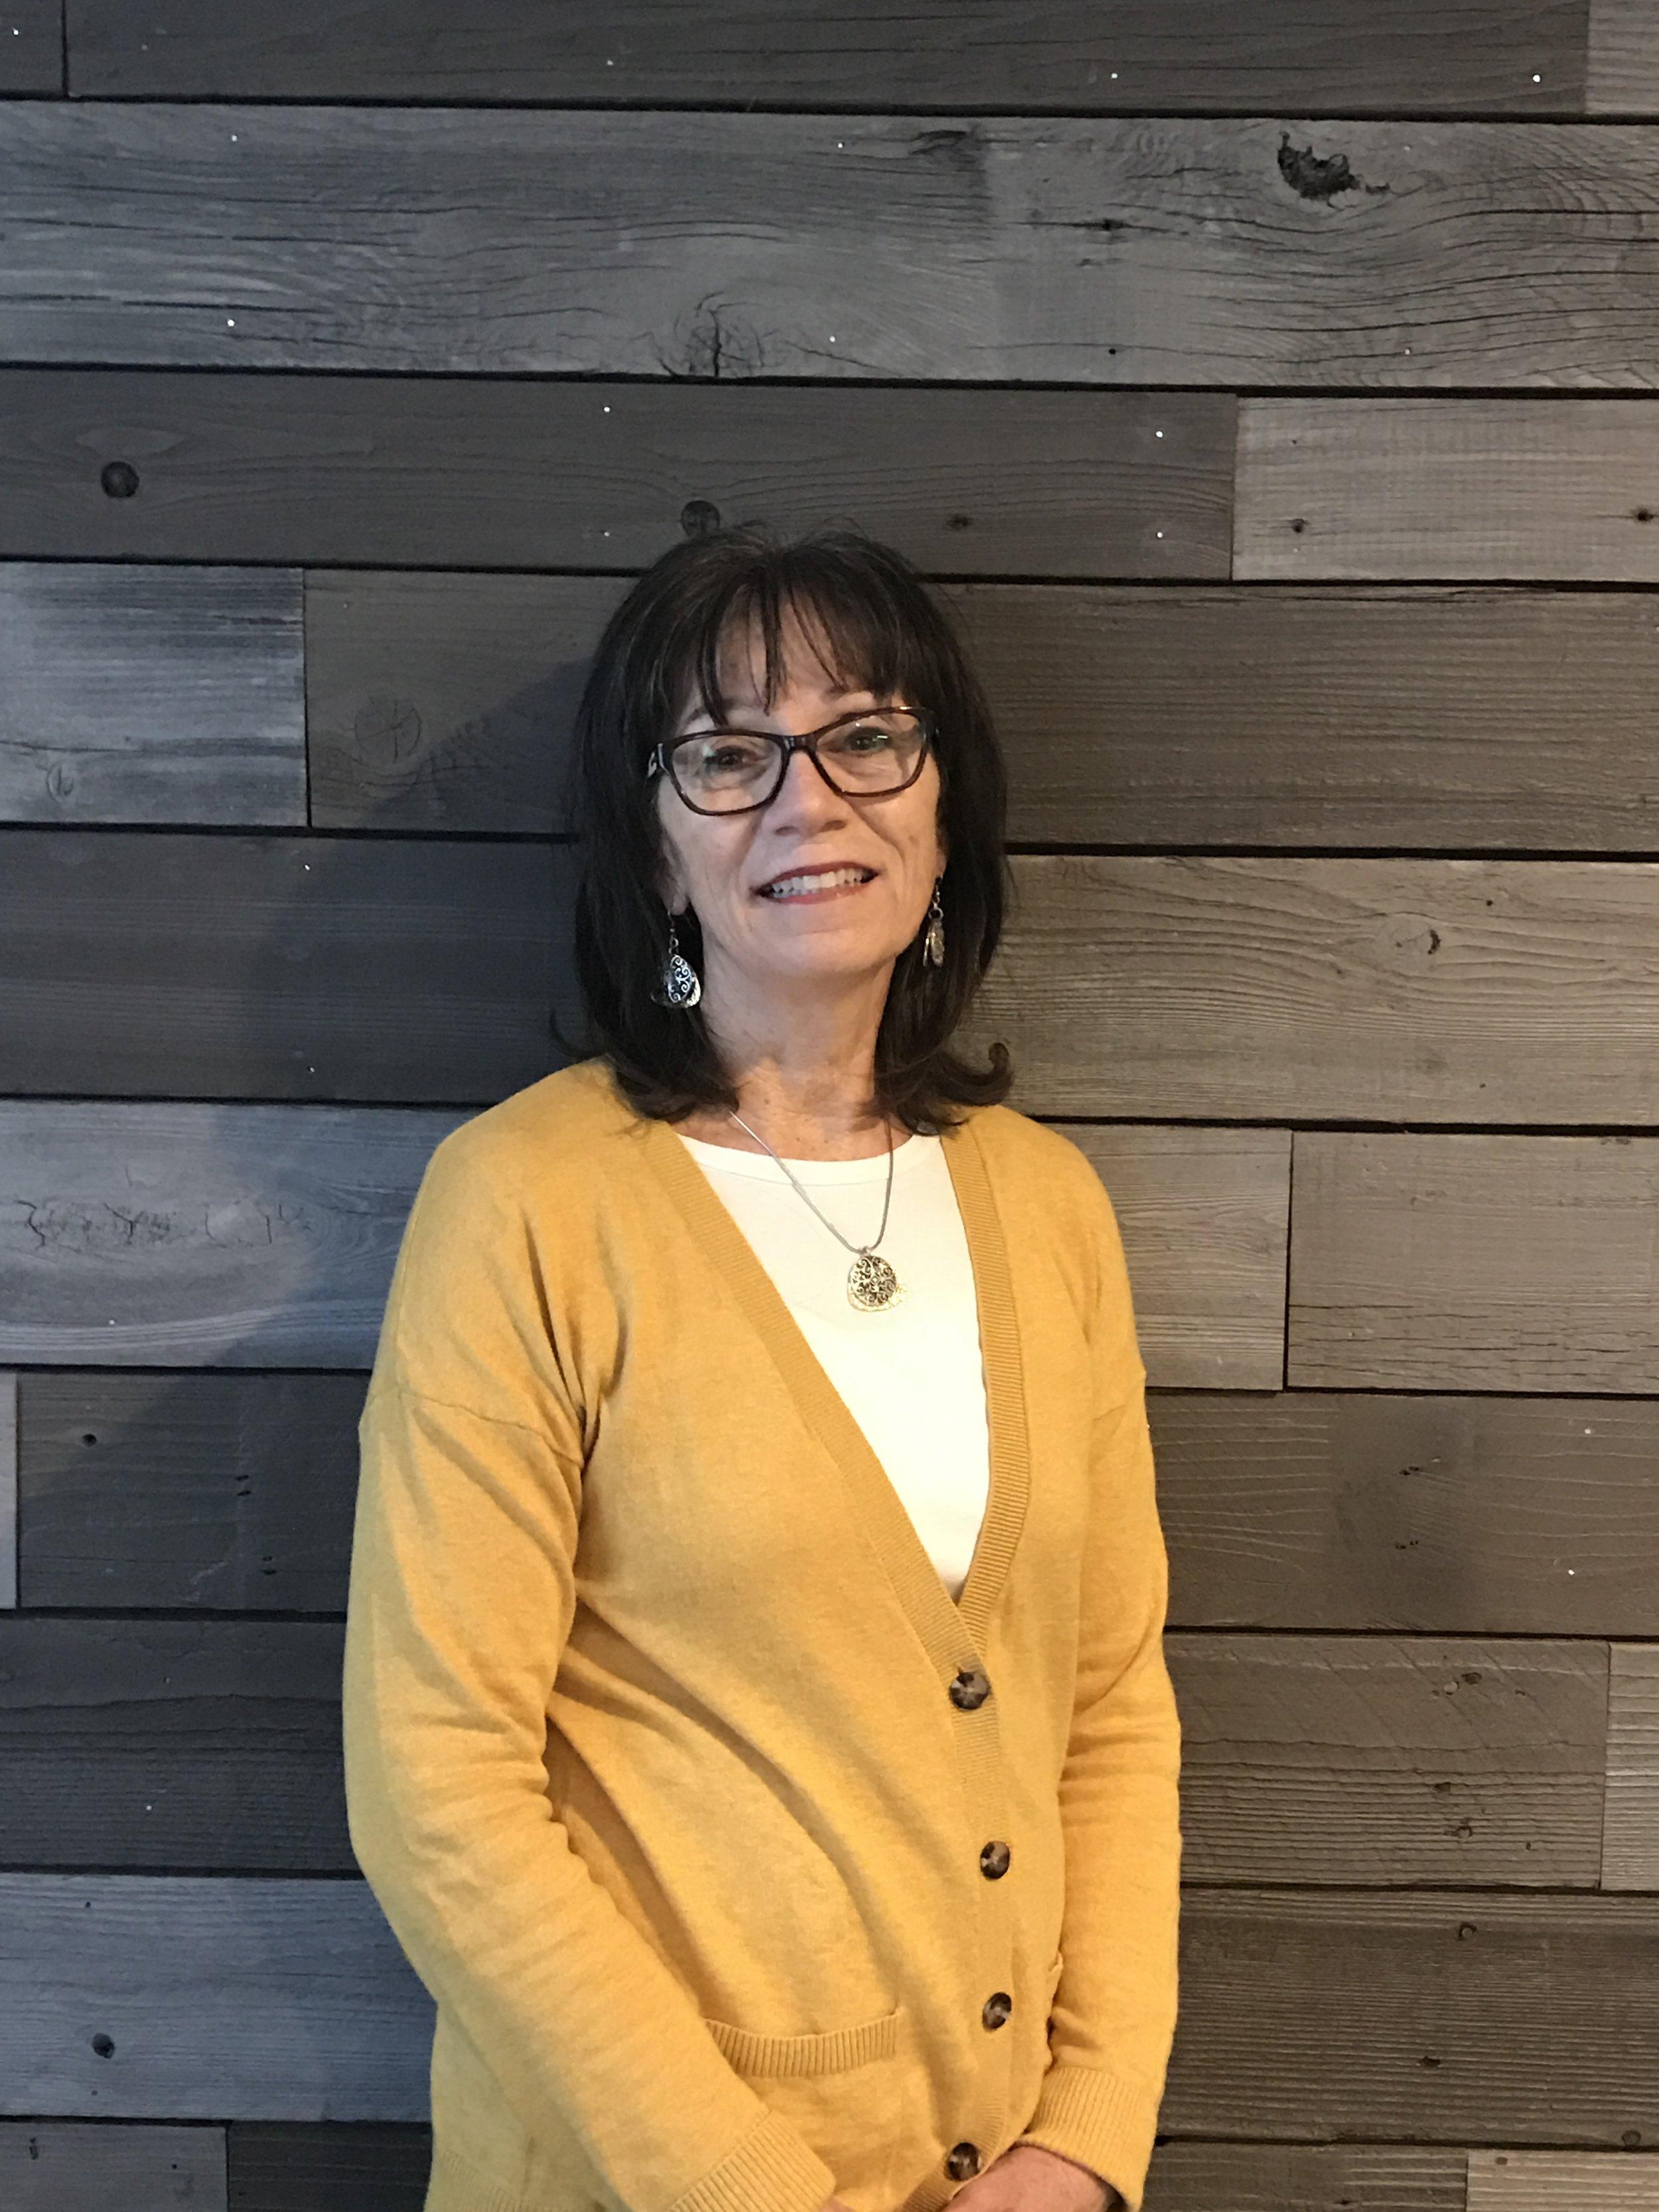 Linda Costantini, Administrator